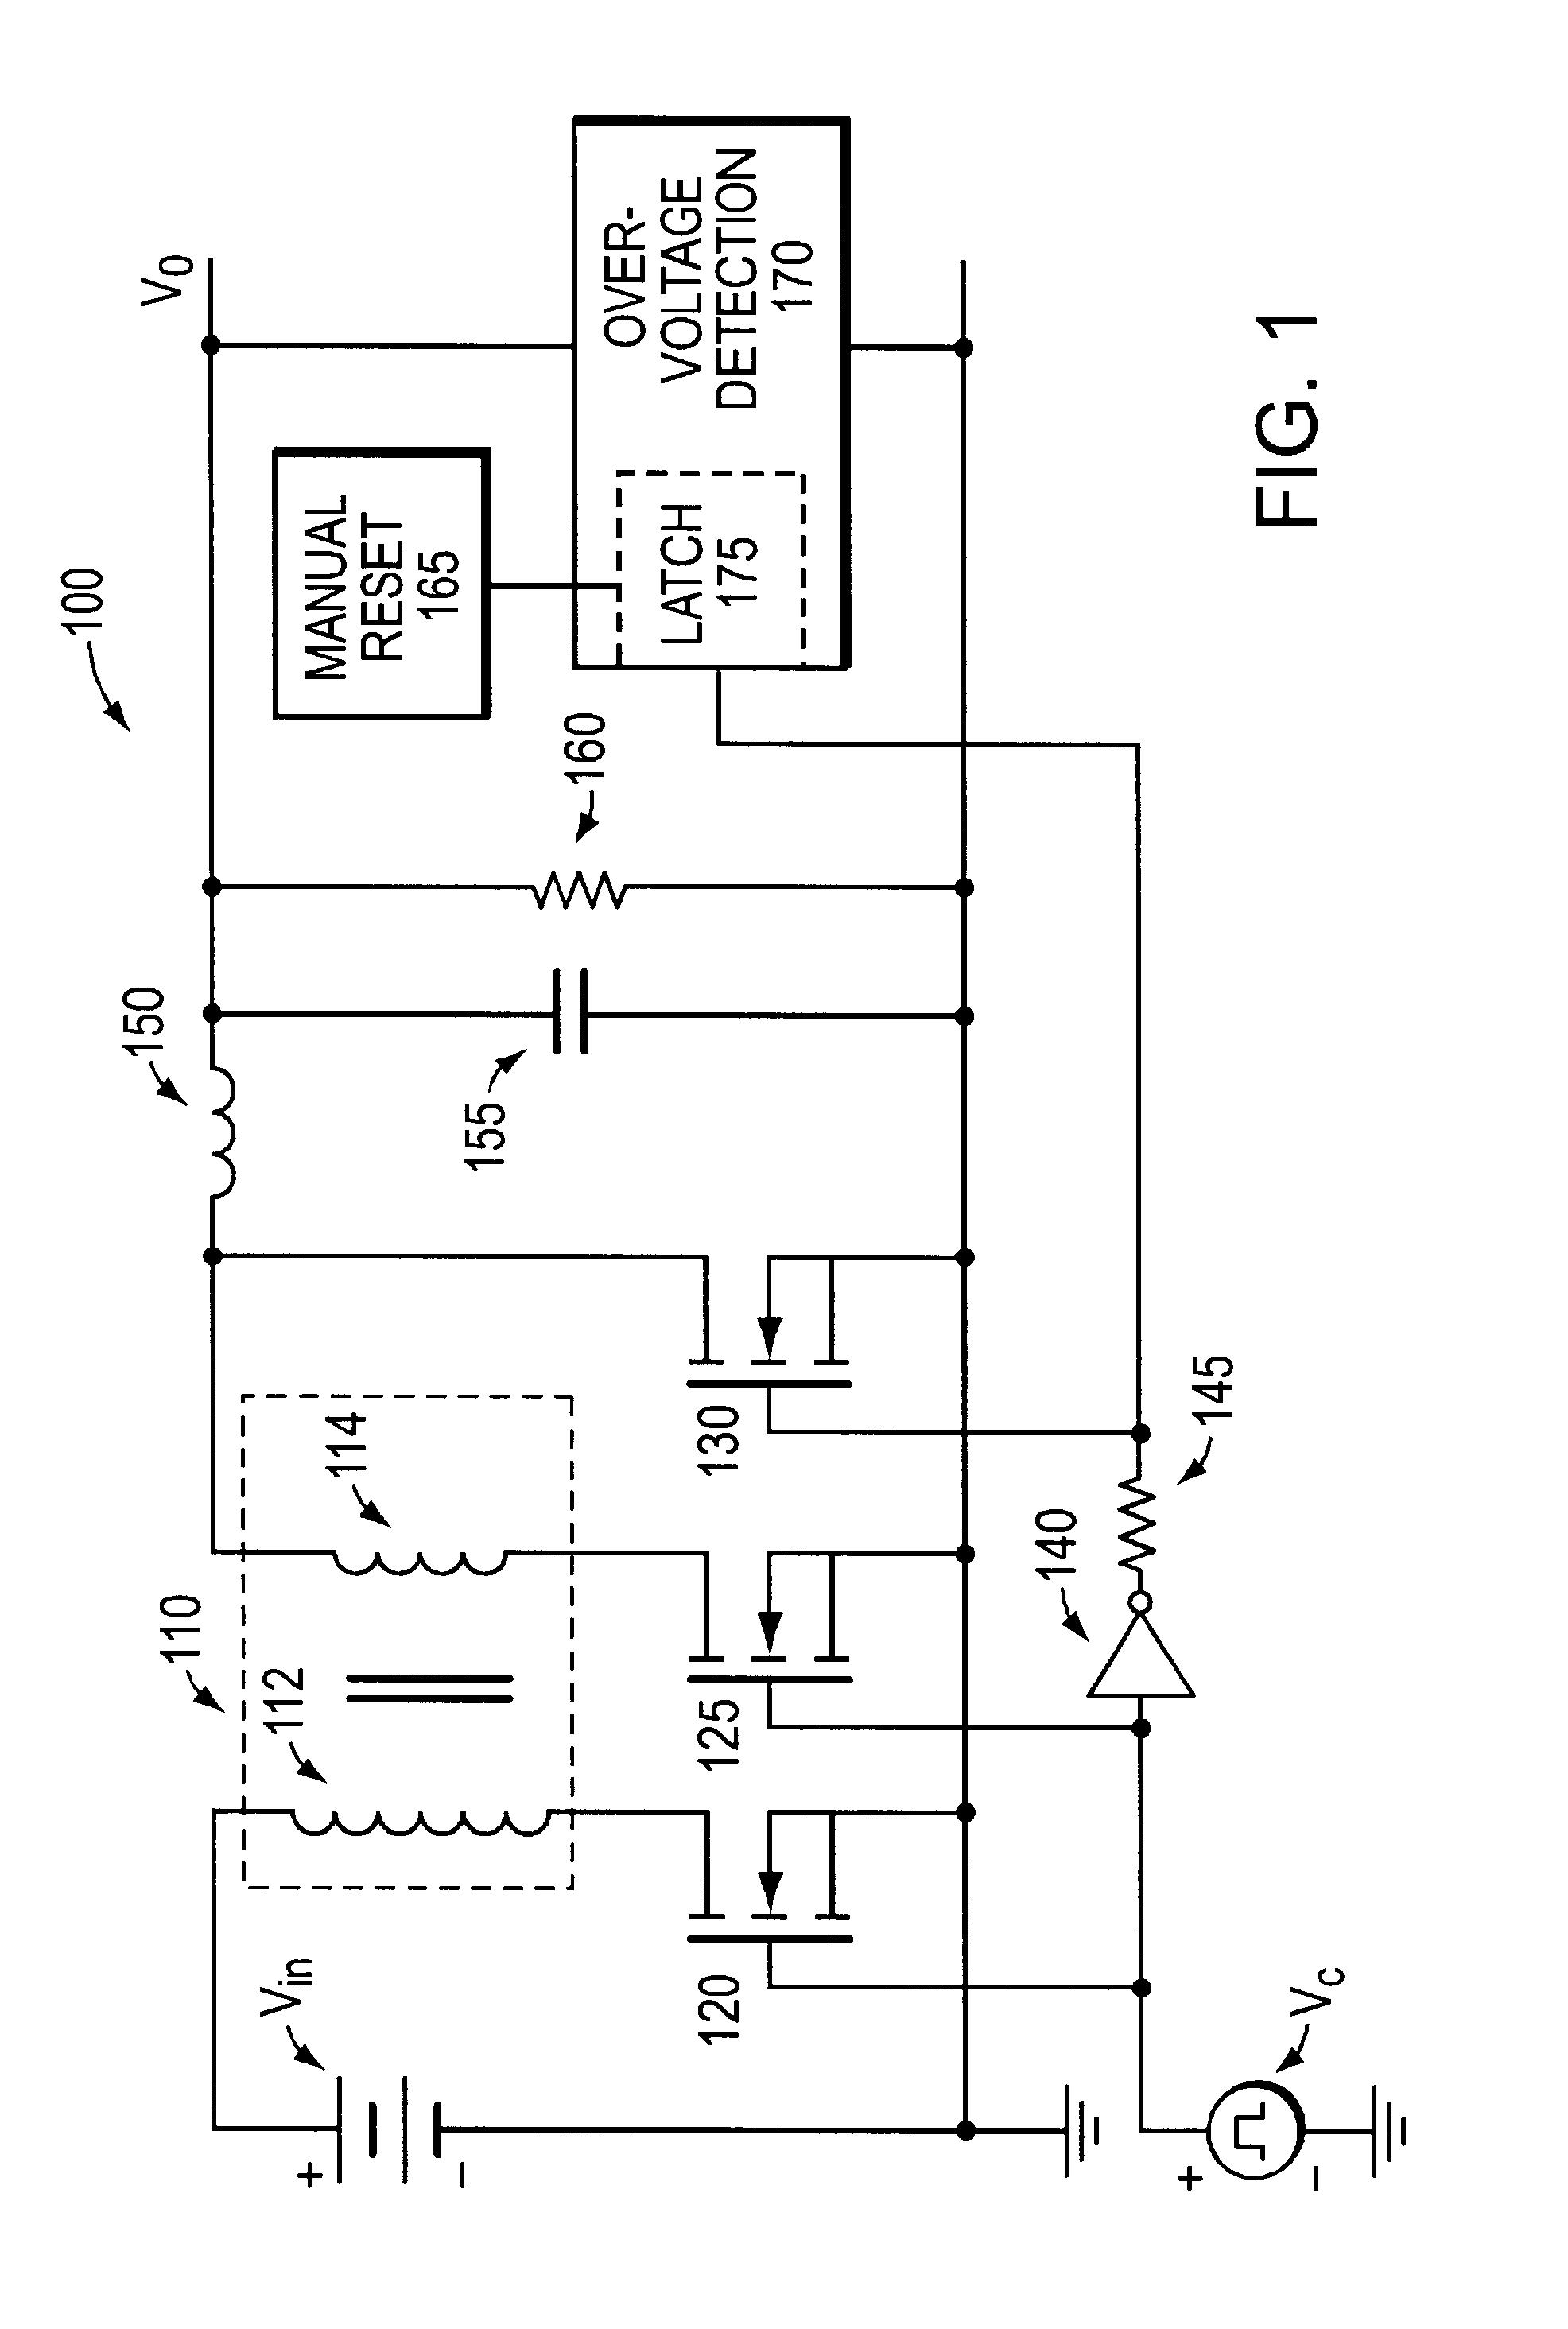 Dc Converter Basics Zvspwm Circuit Basiccircuit Diagram Seekiccom For Low Output Voltage Converters Google Patents